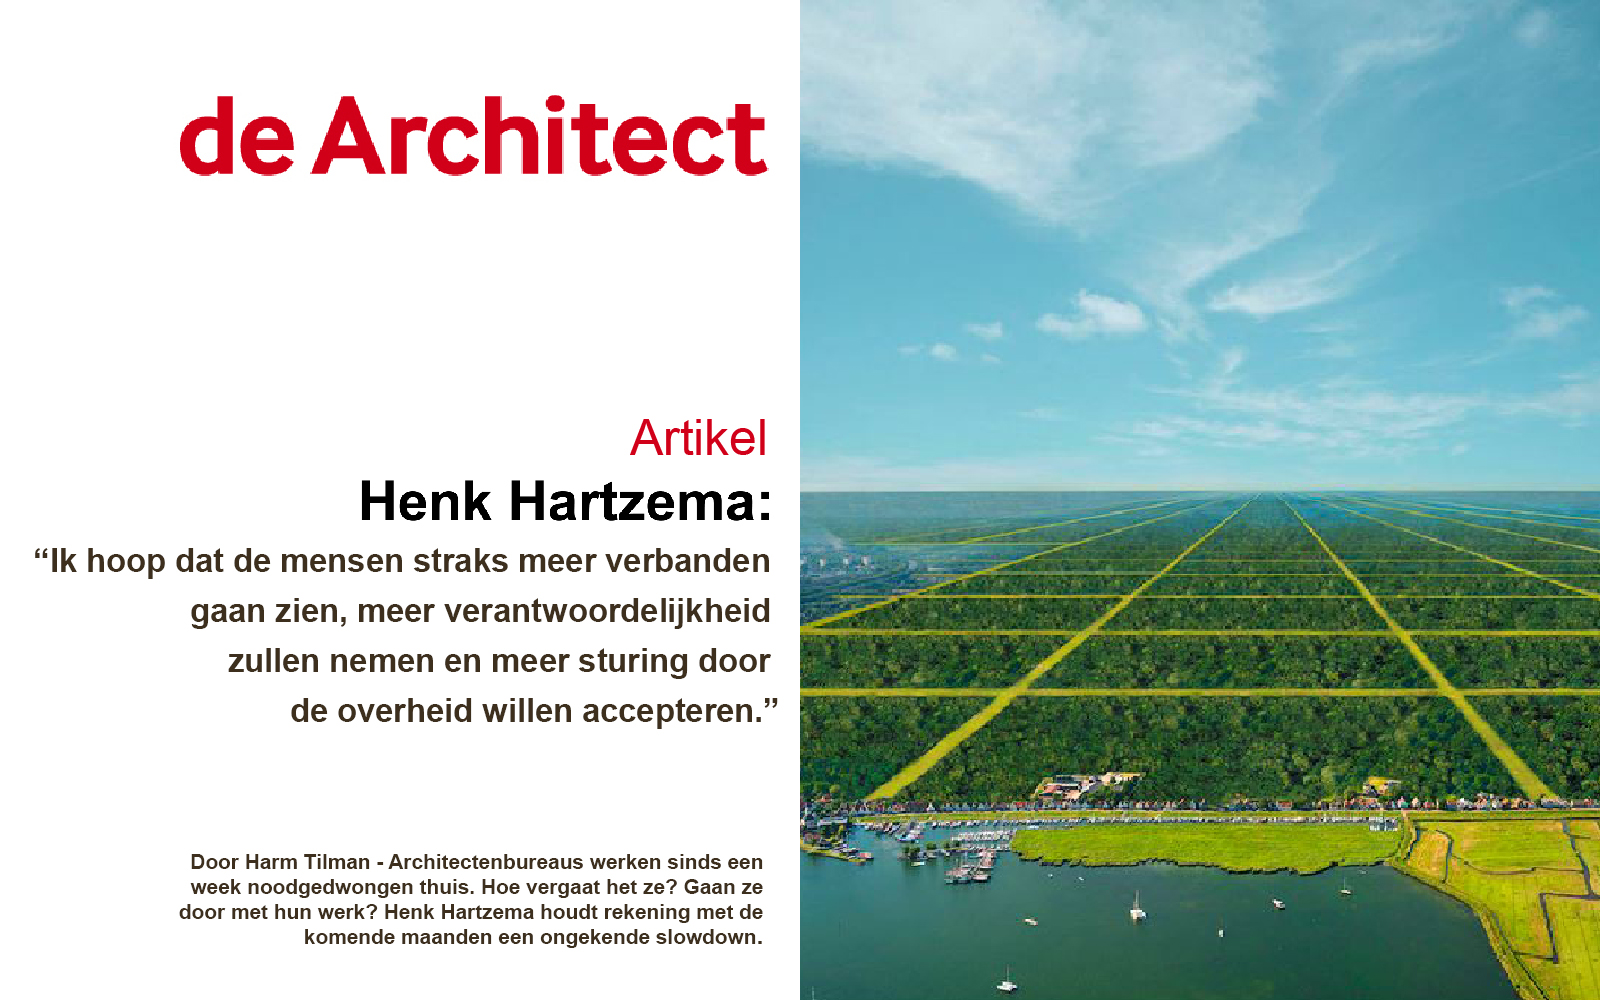 De Architect Studio Hartzema